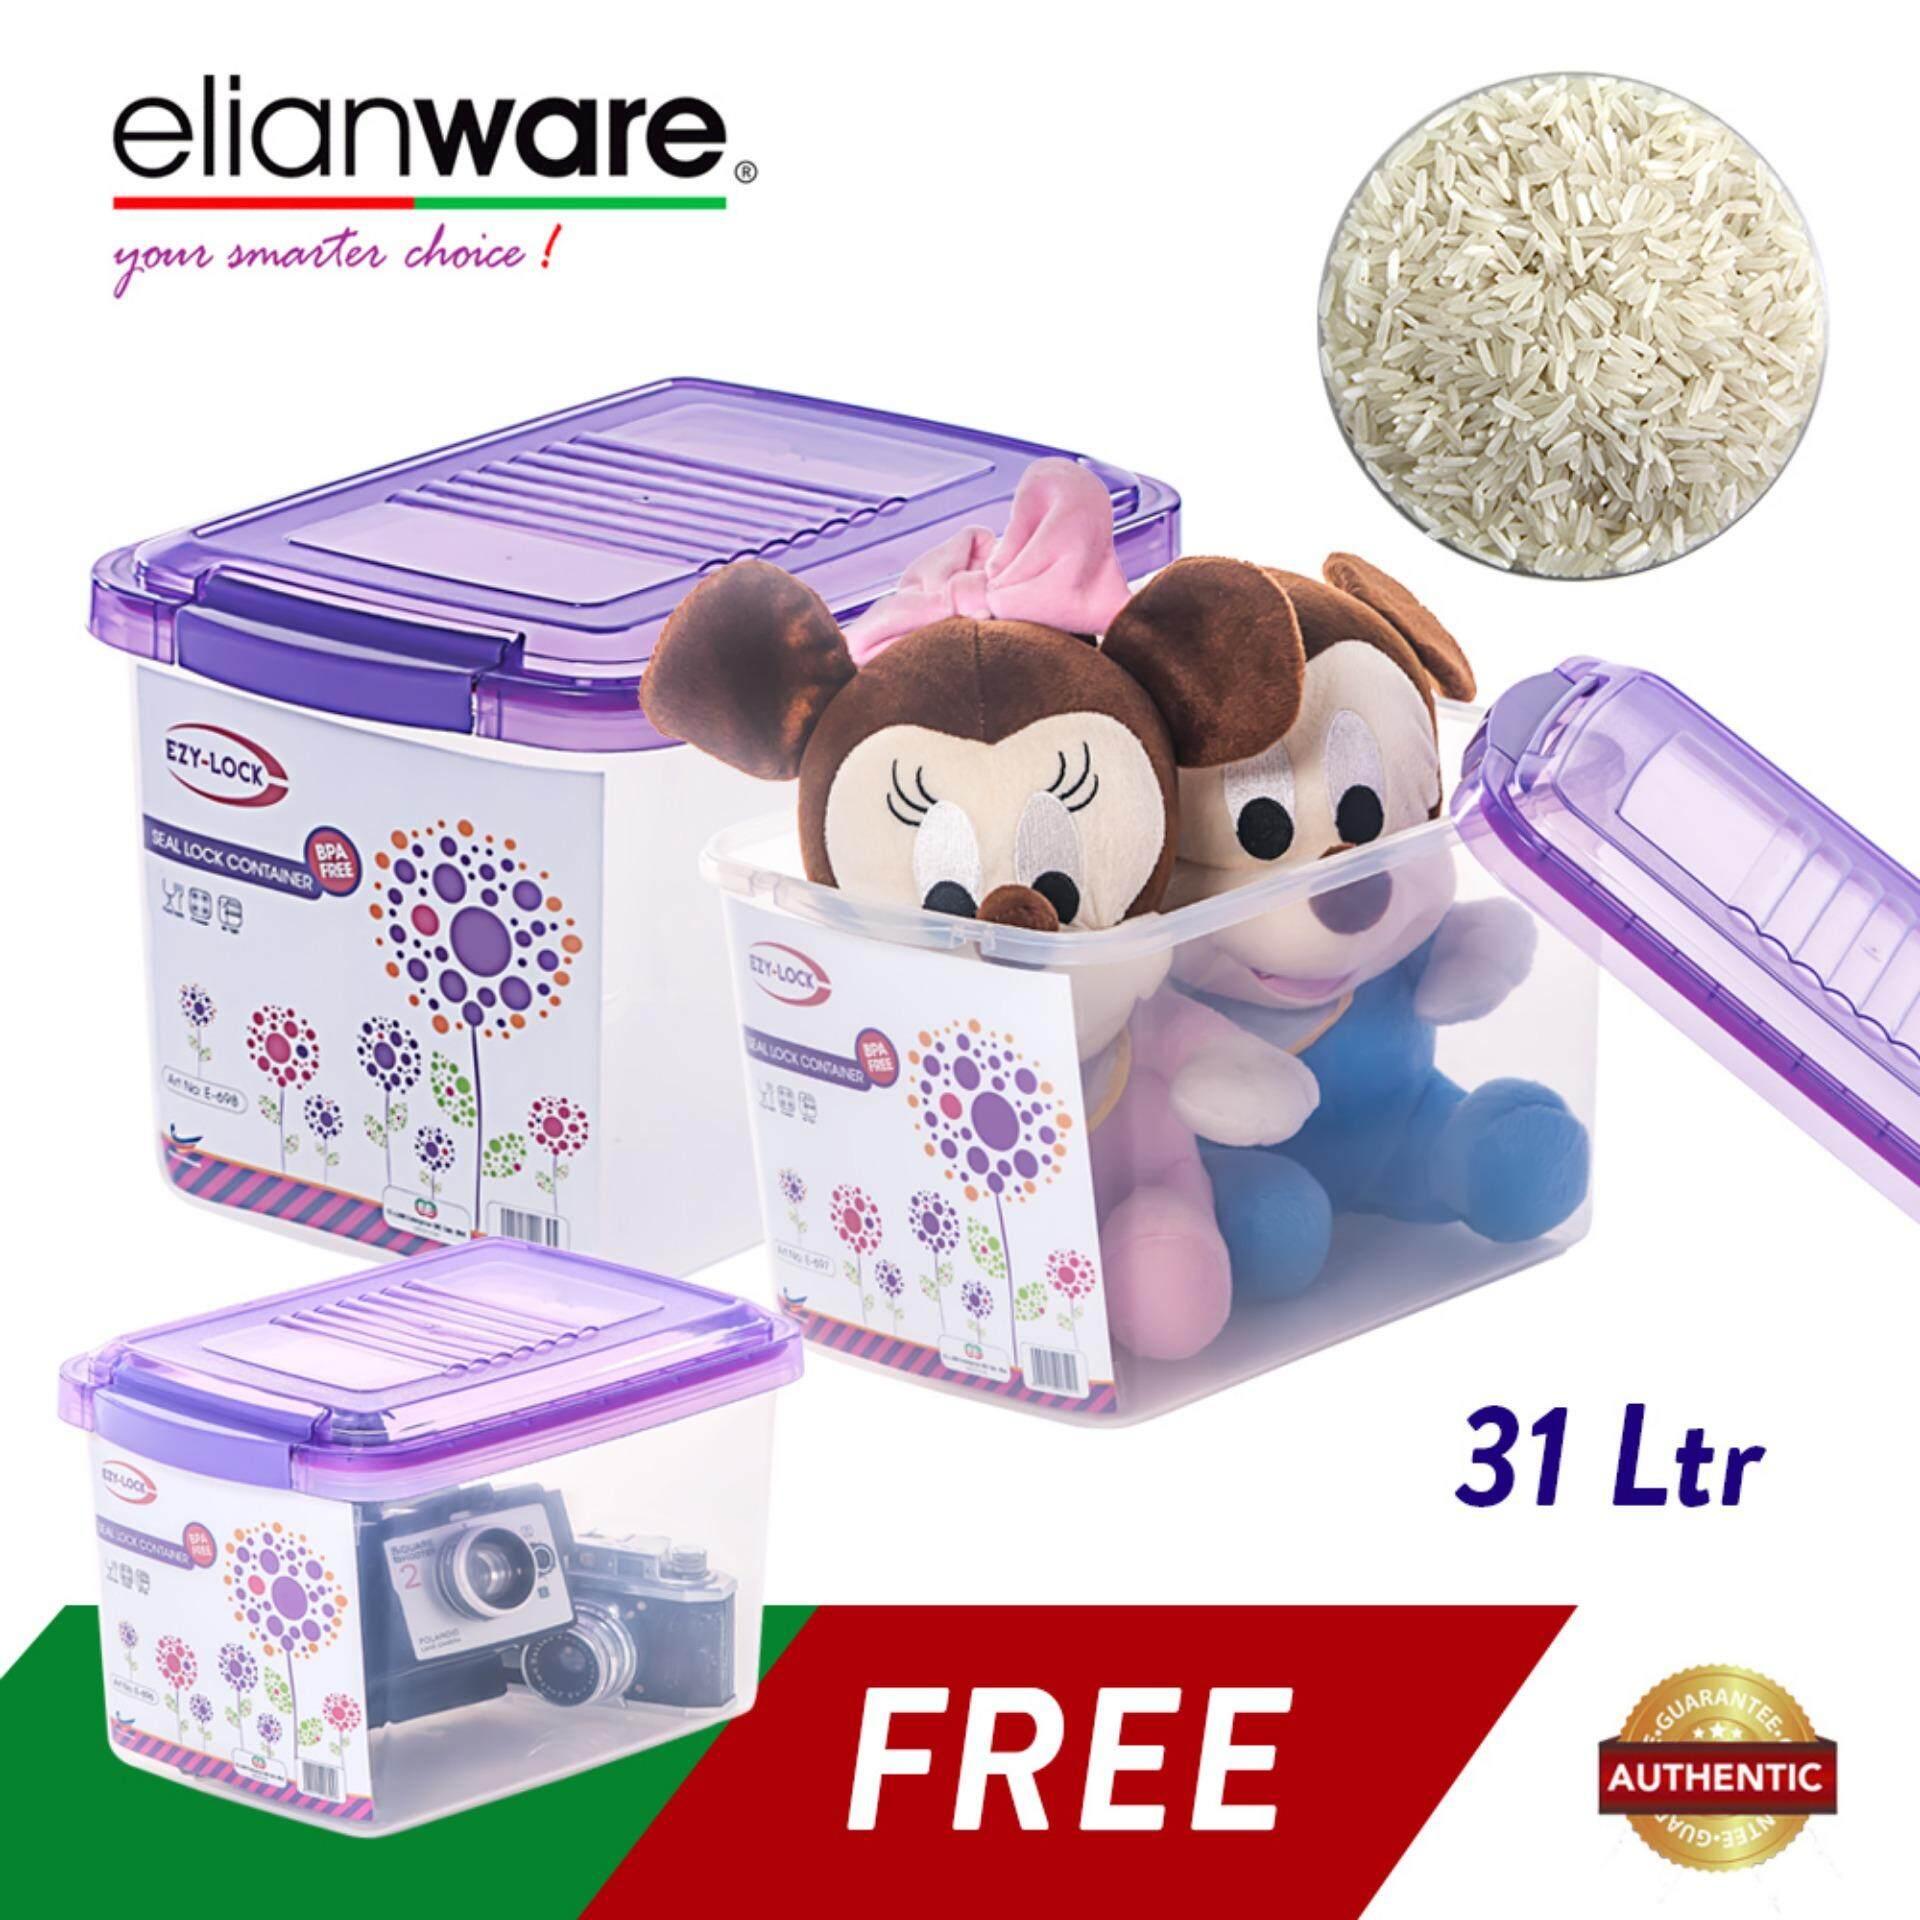 Elianware 3 Pcs Ezy-Lock 100% Airtight Seal Lock Container Kitchen Rice Food Storage